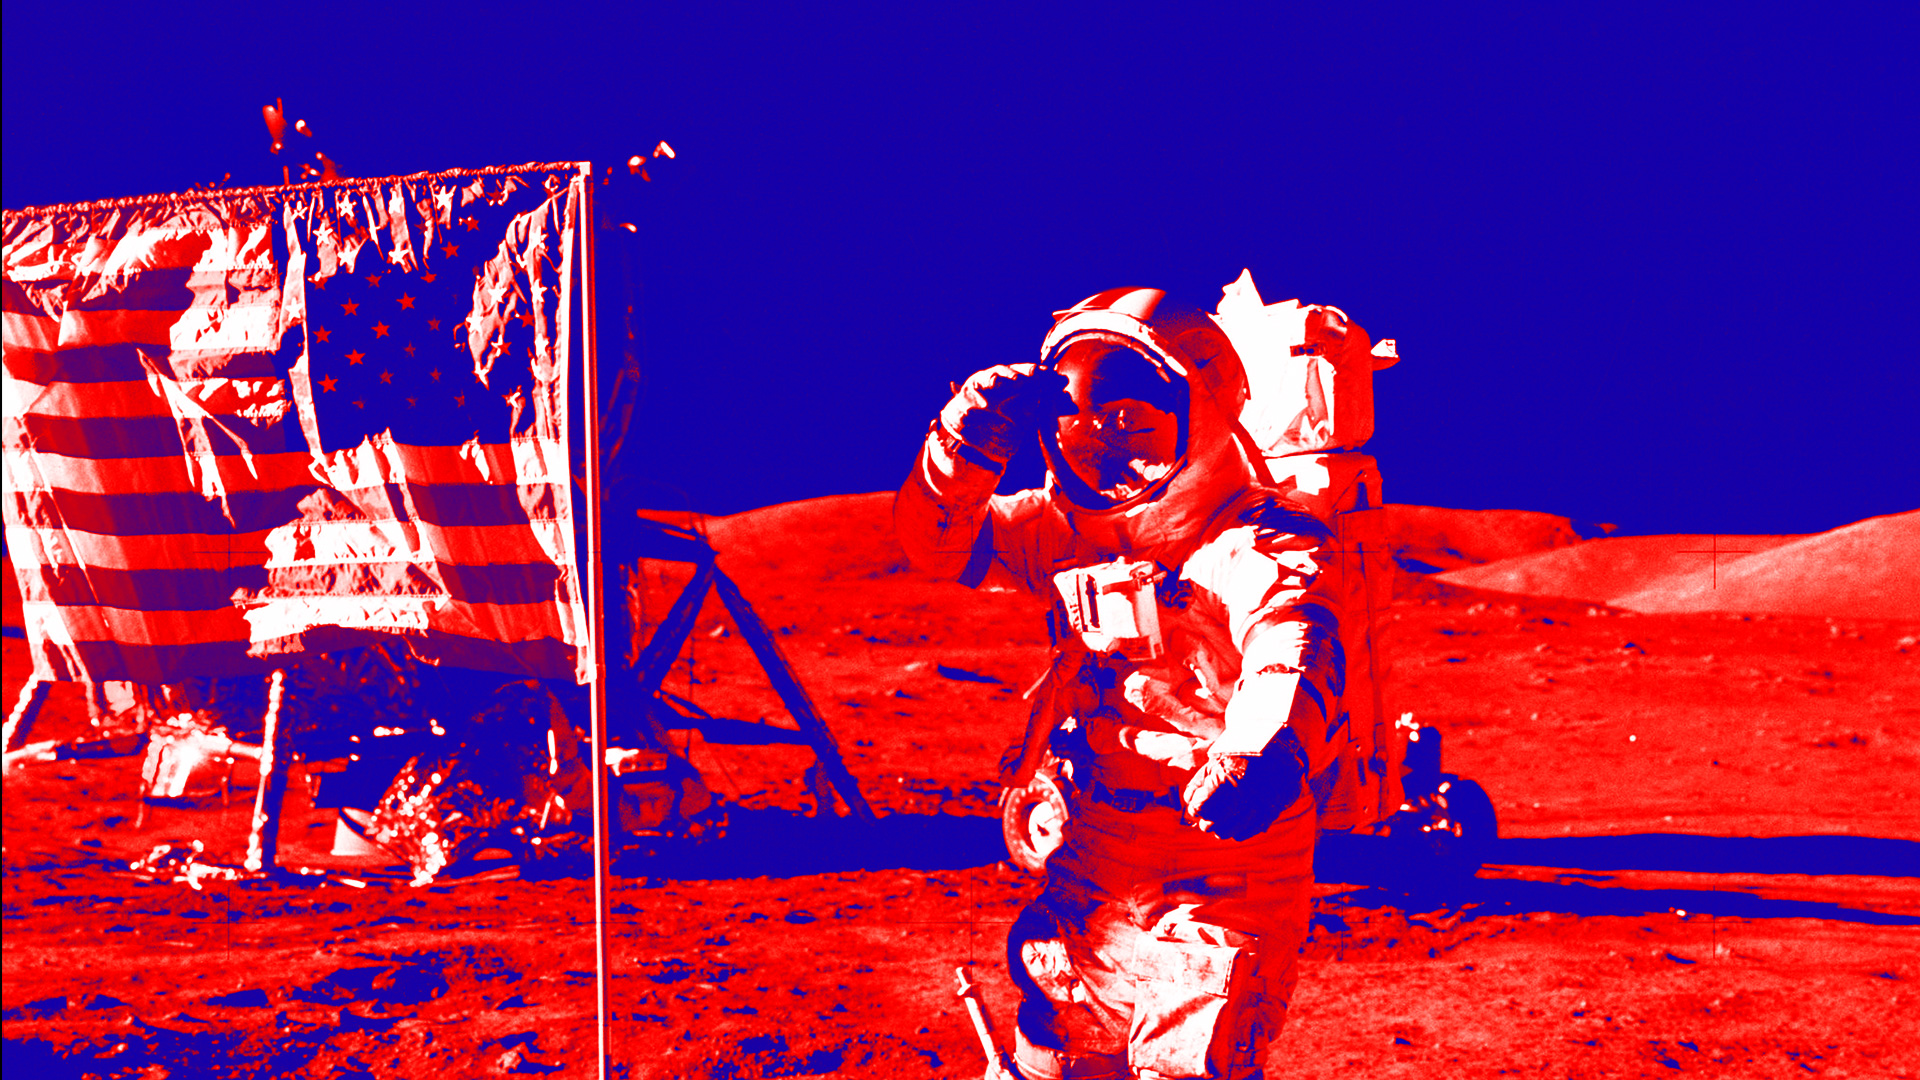 Moon Landing by America - presentation Background